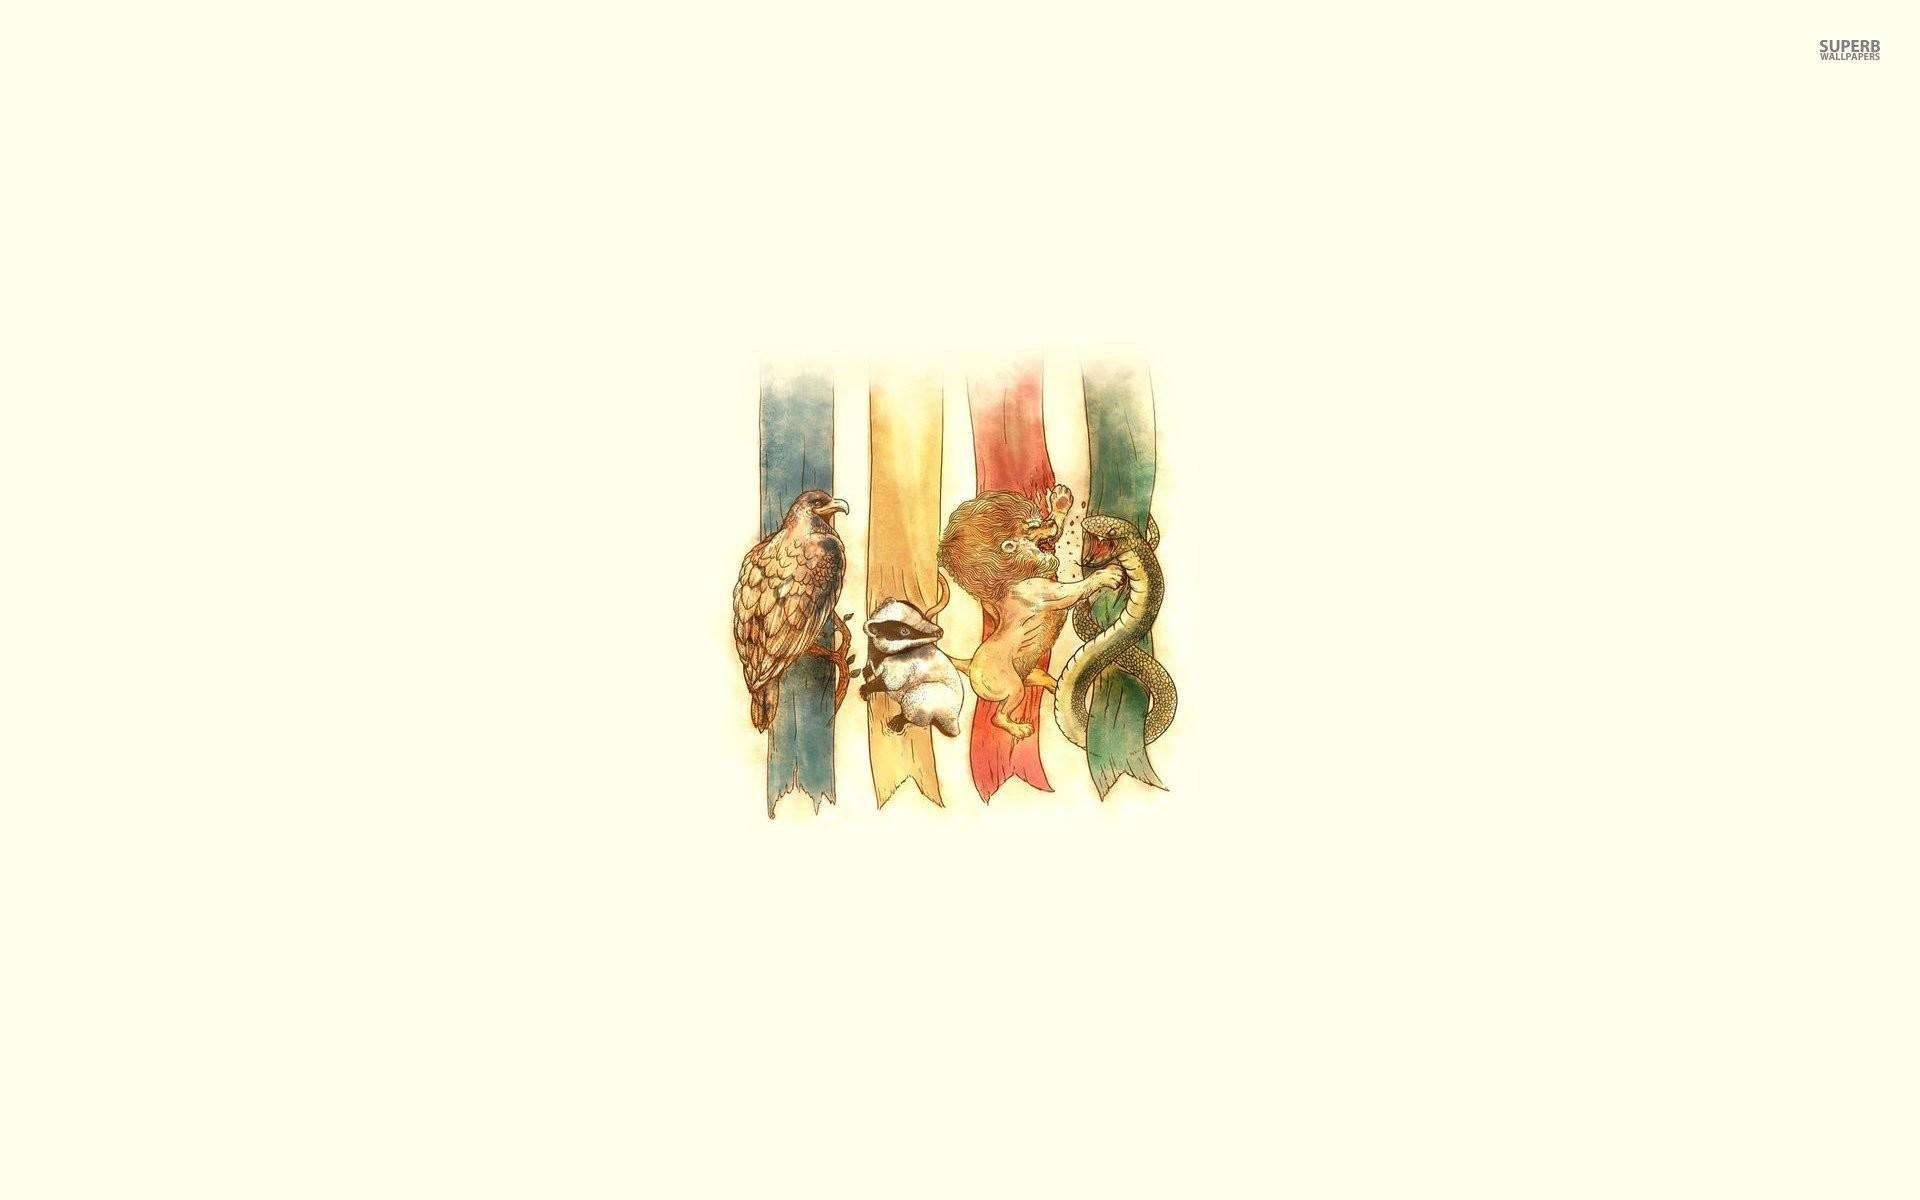 1920x1200 Harry Potter Tumblr Wallpaper Ravenclaw Image 767637